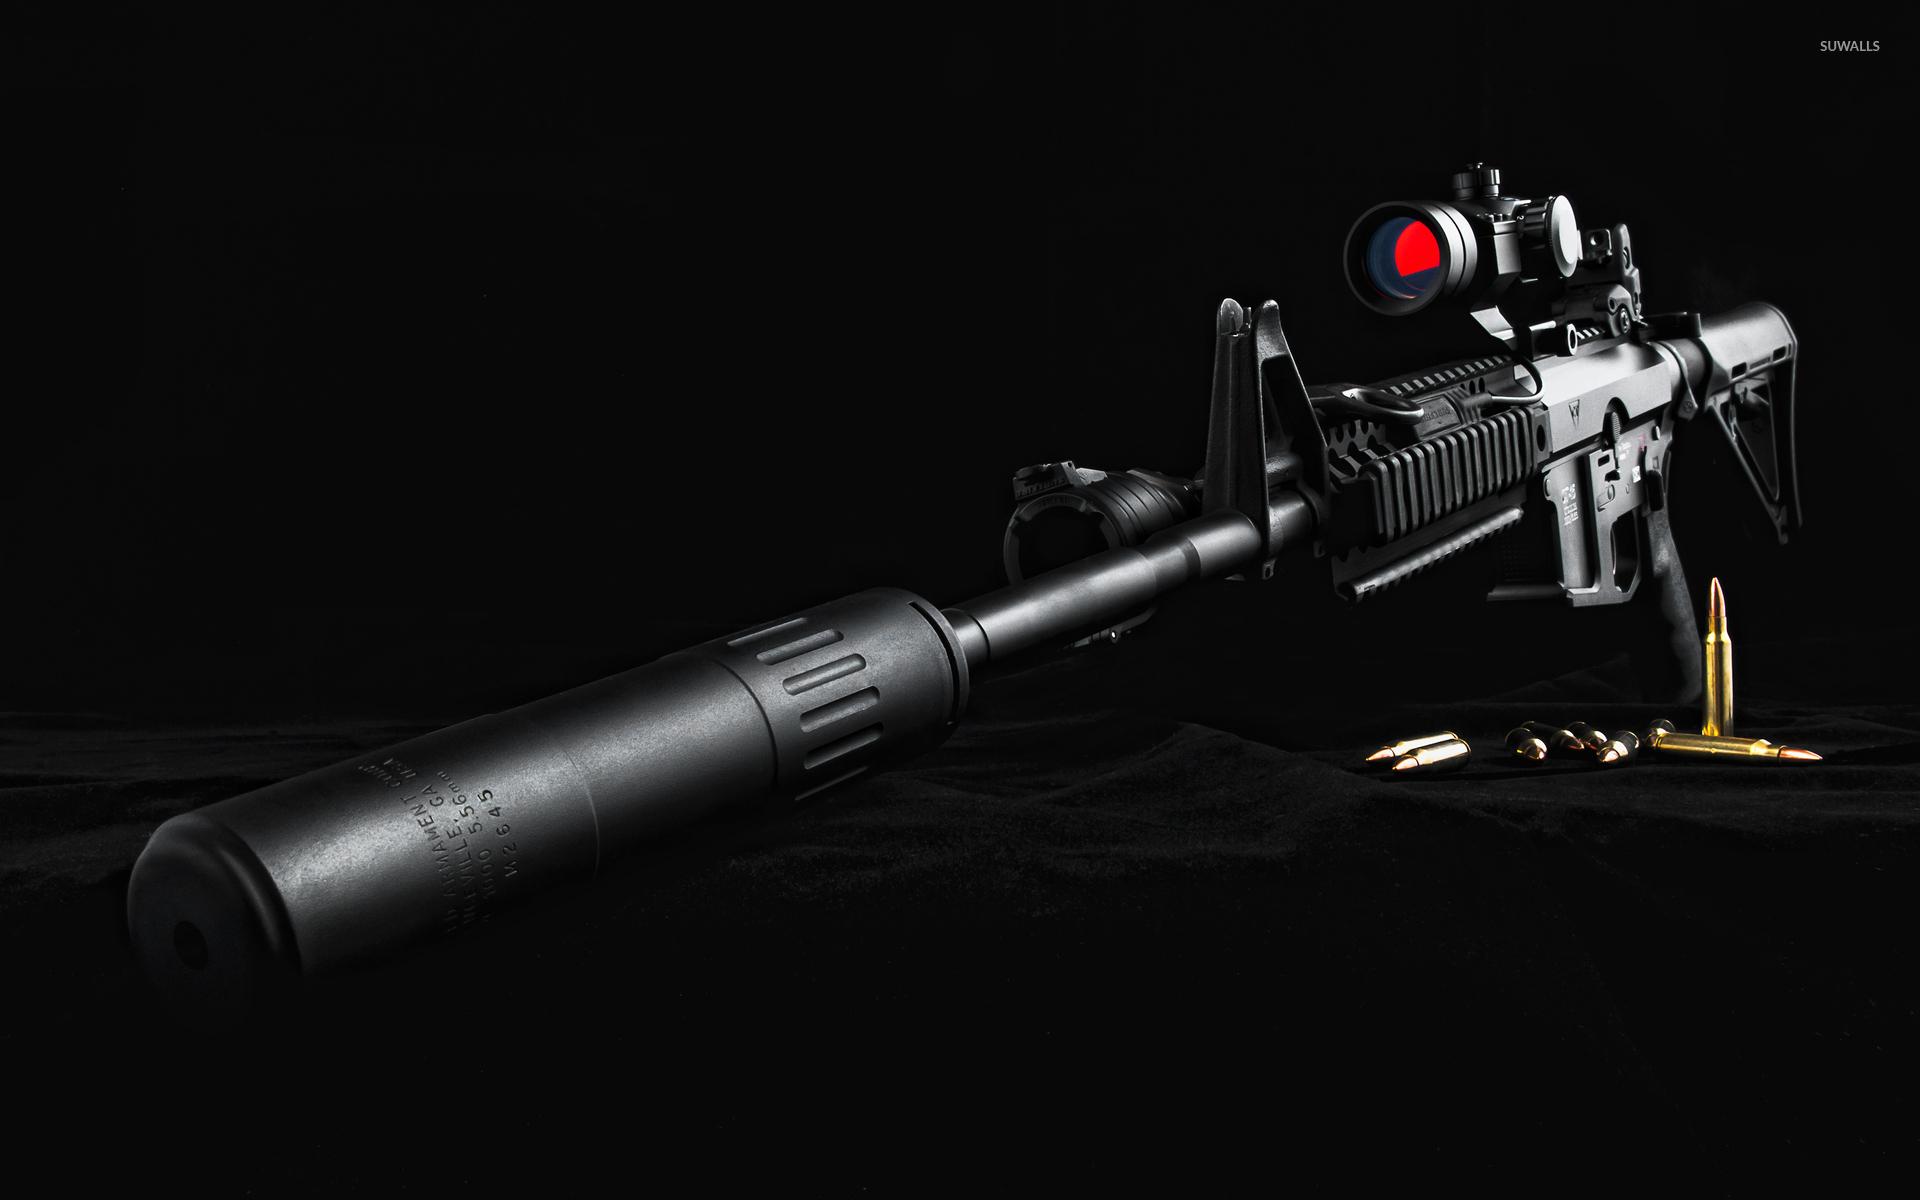 blackguns black guns bullets - photo #46